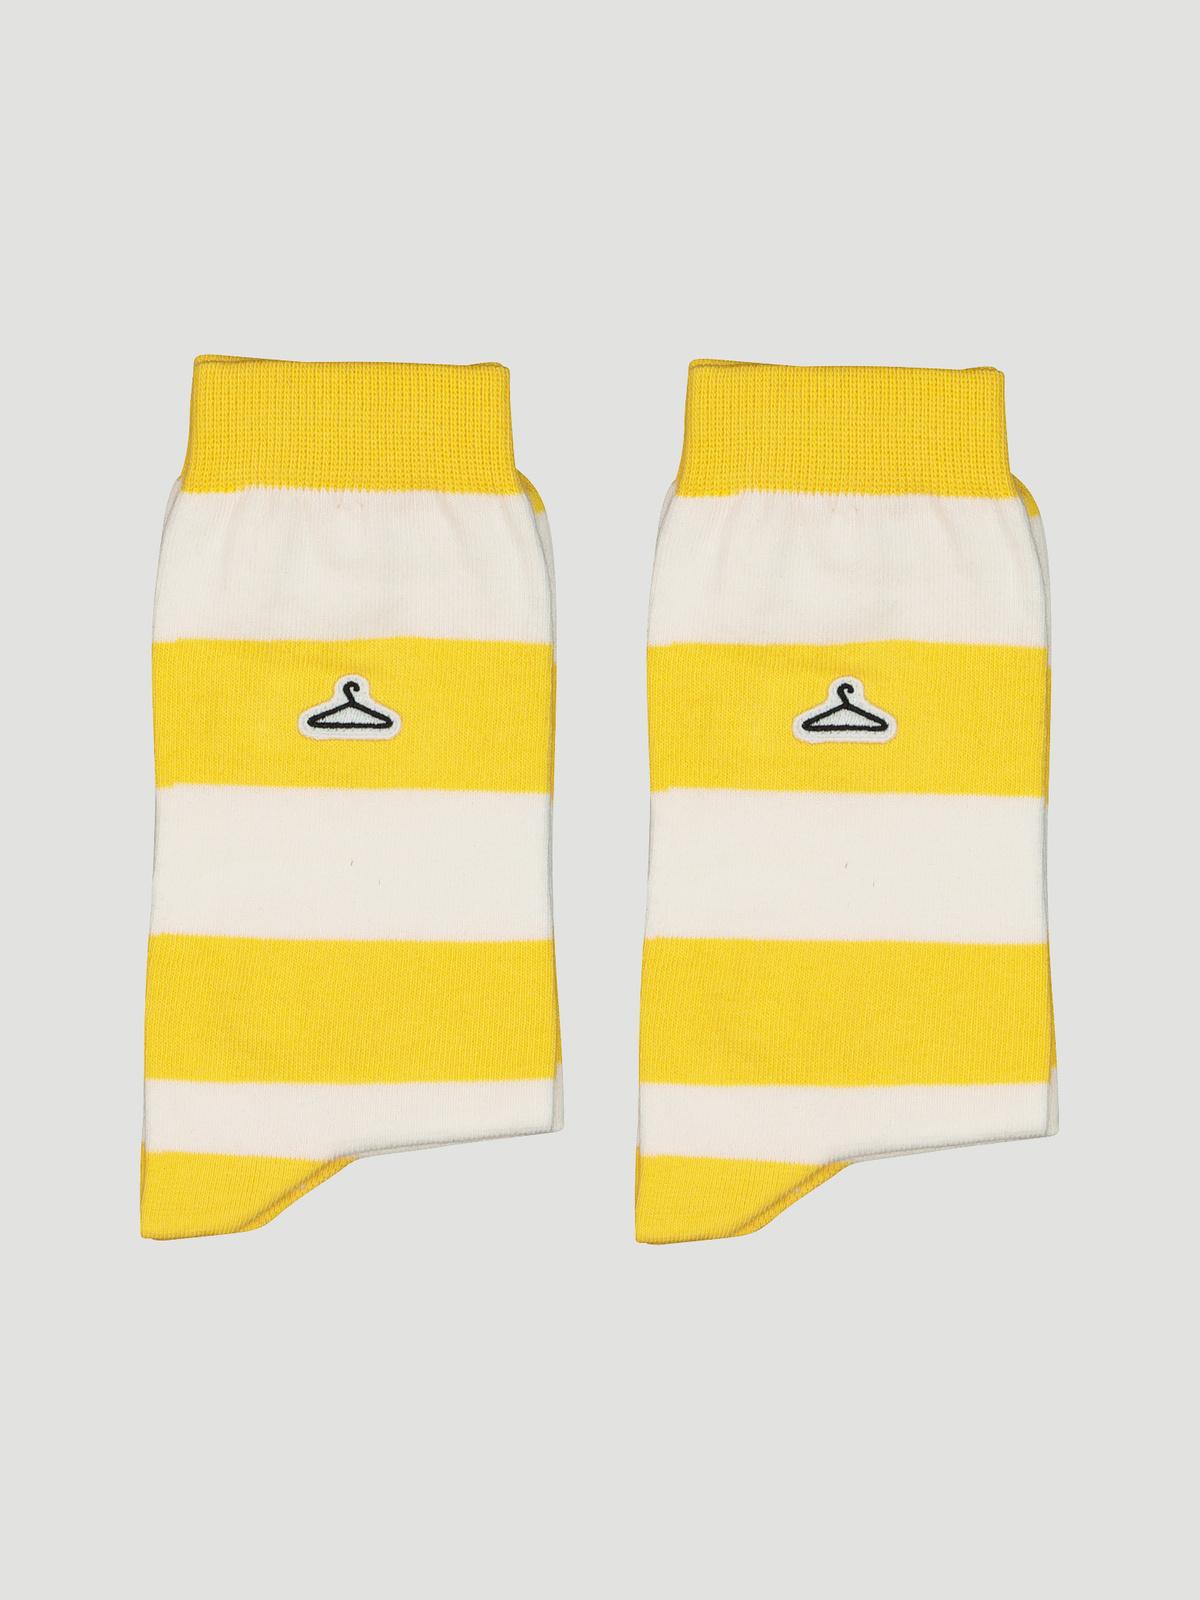 Hanger Striped Sock Yellow White 2